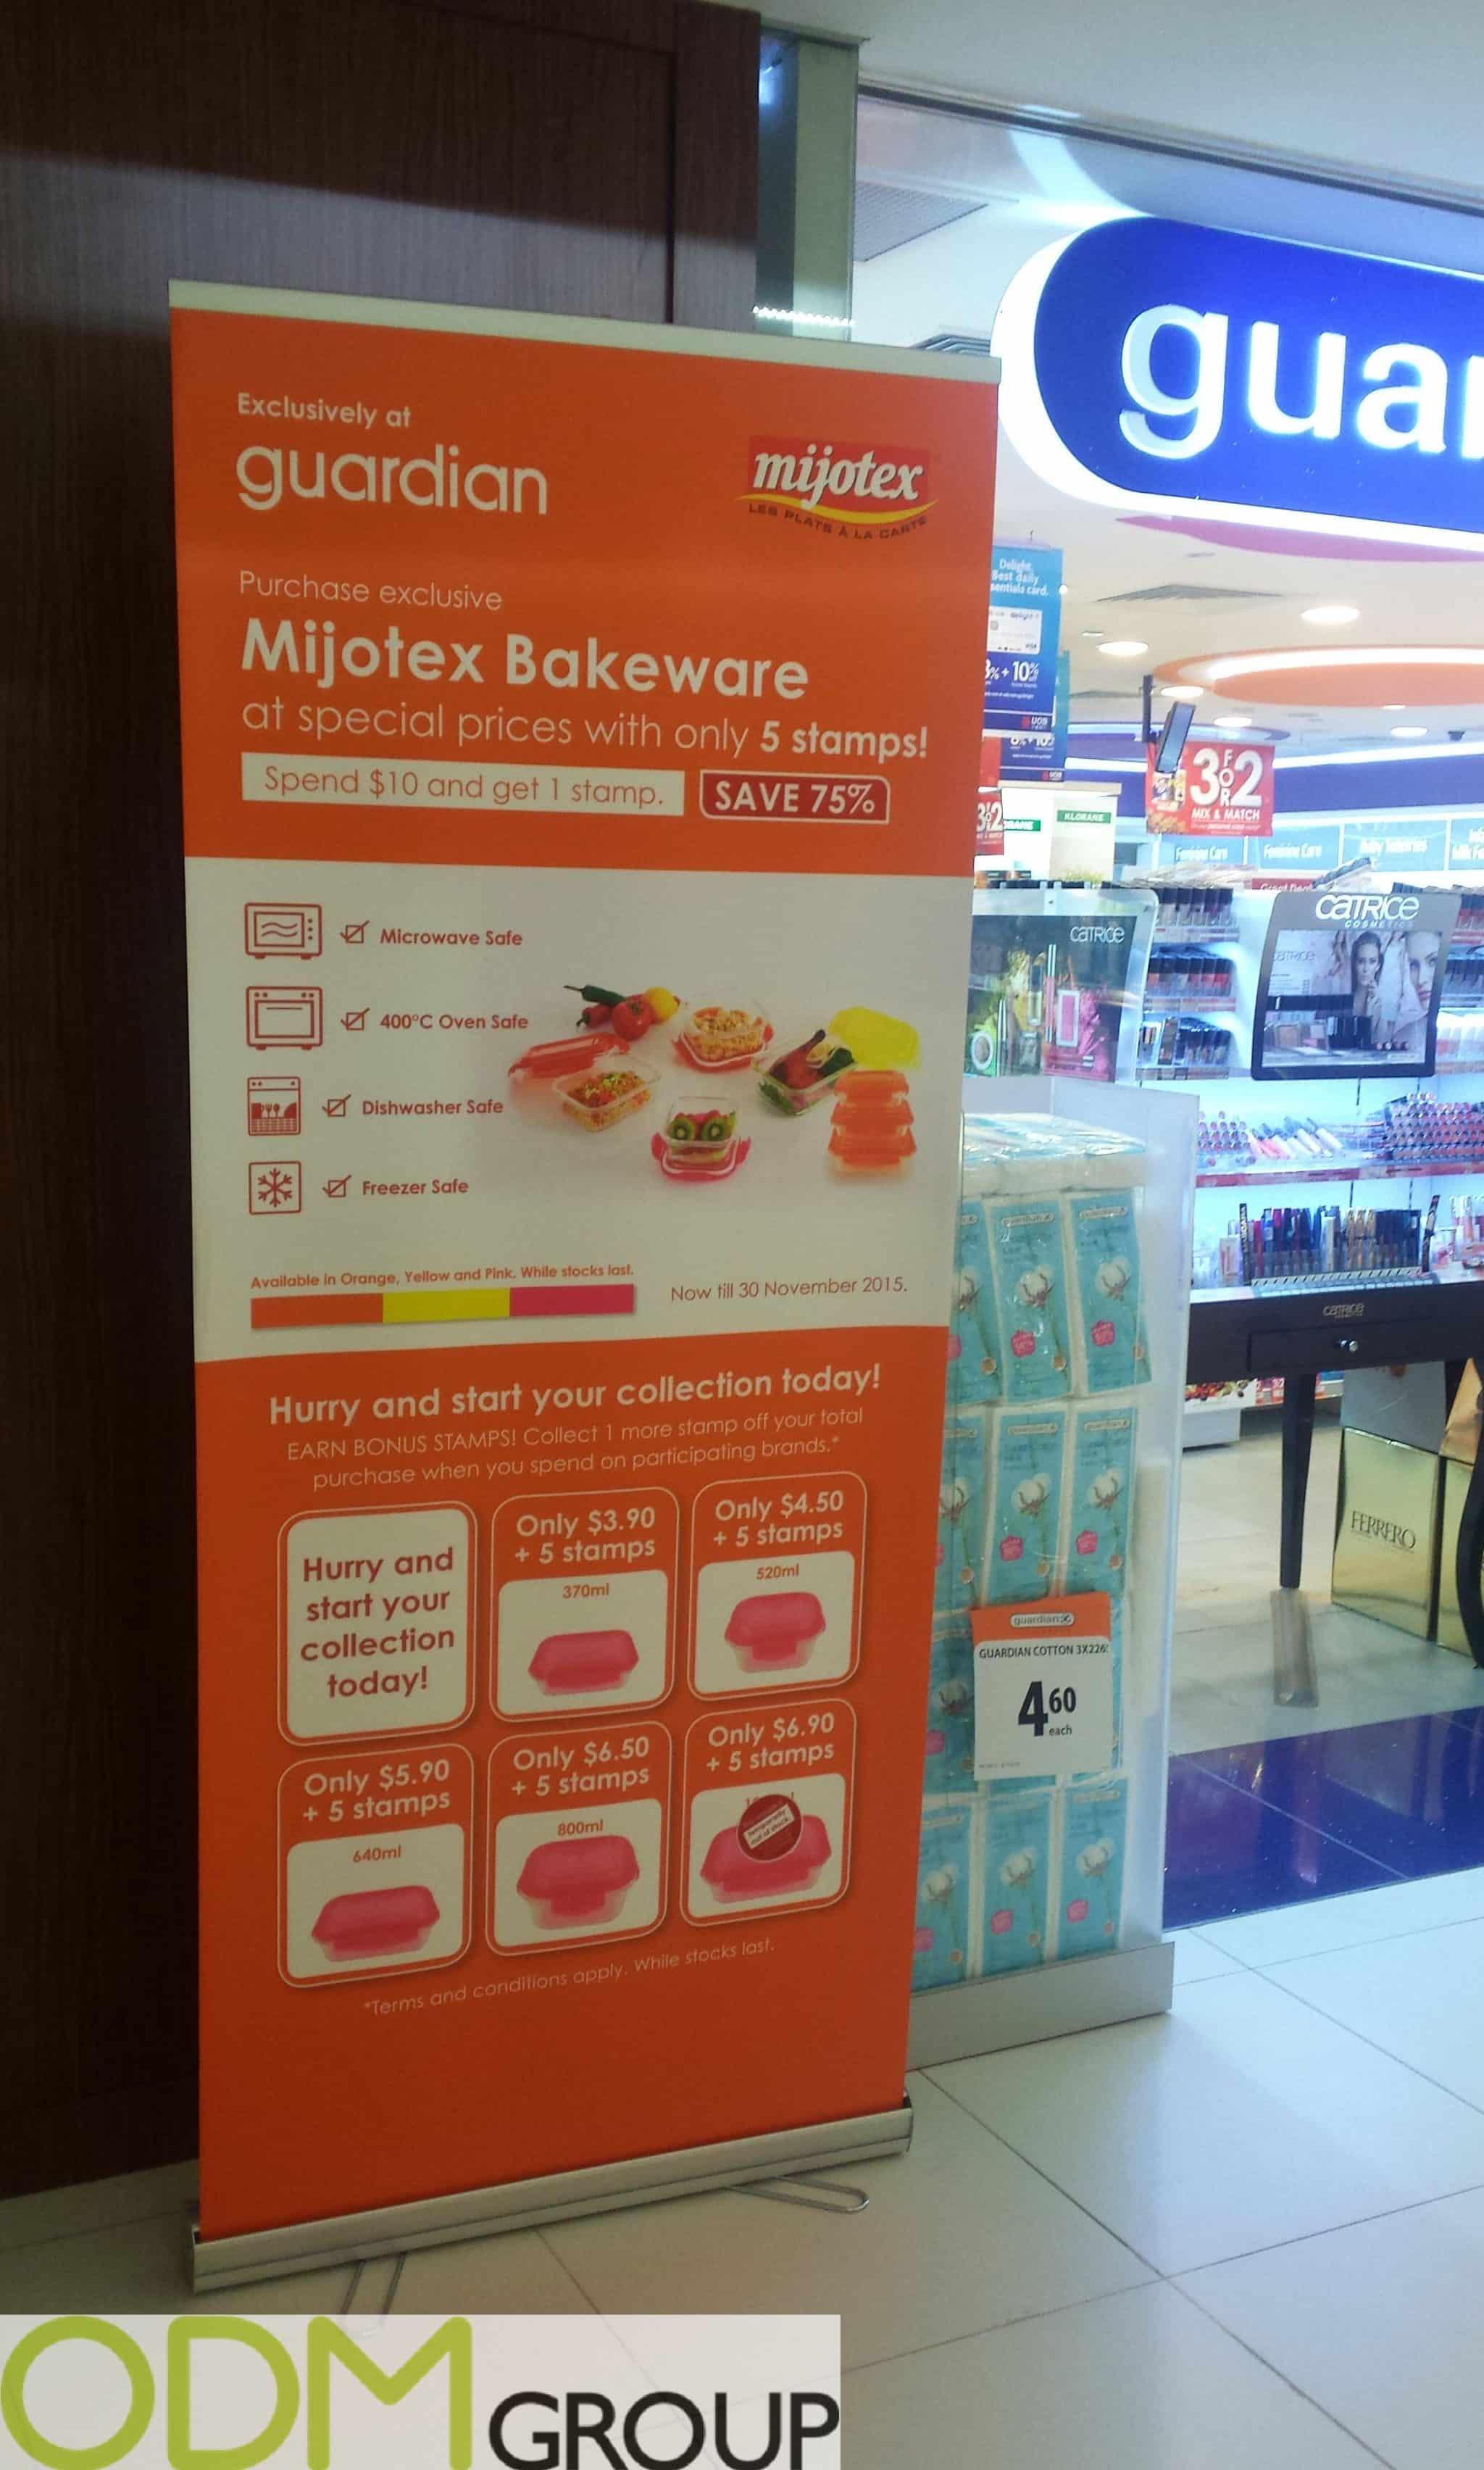 Guardian On-Premise Display for Mijotex Bakeware